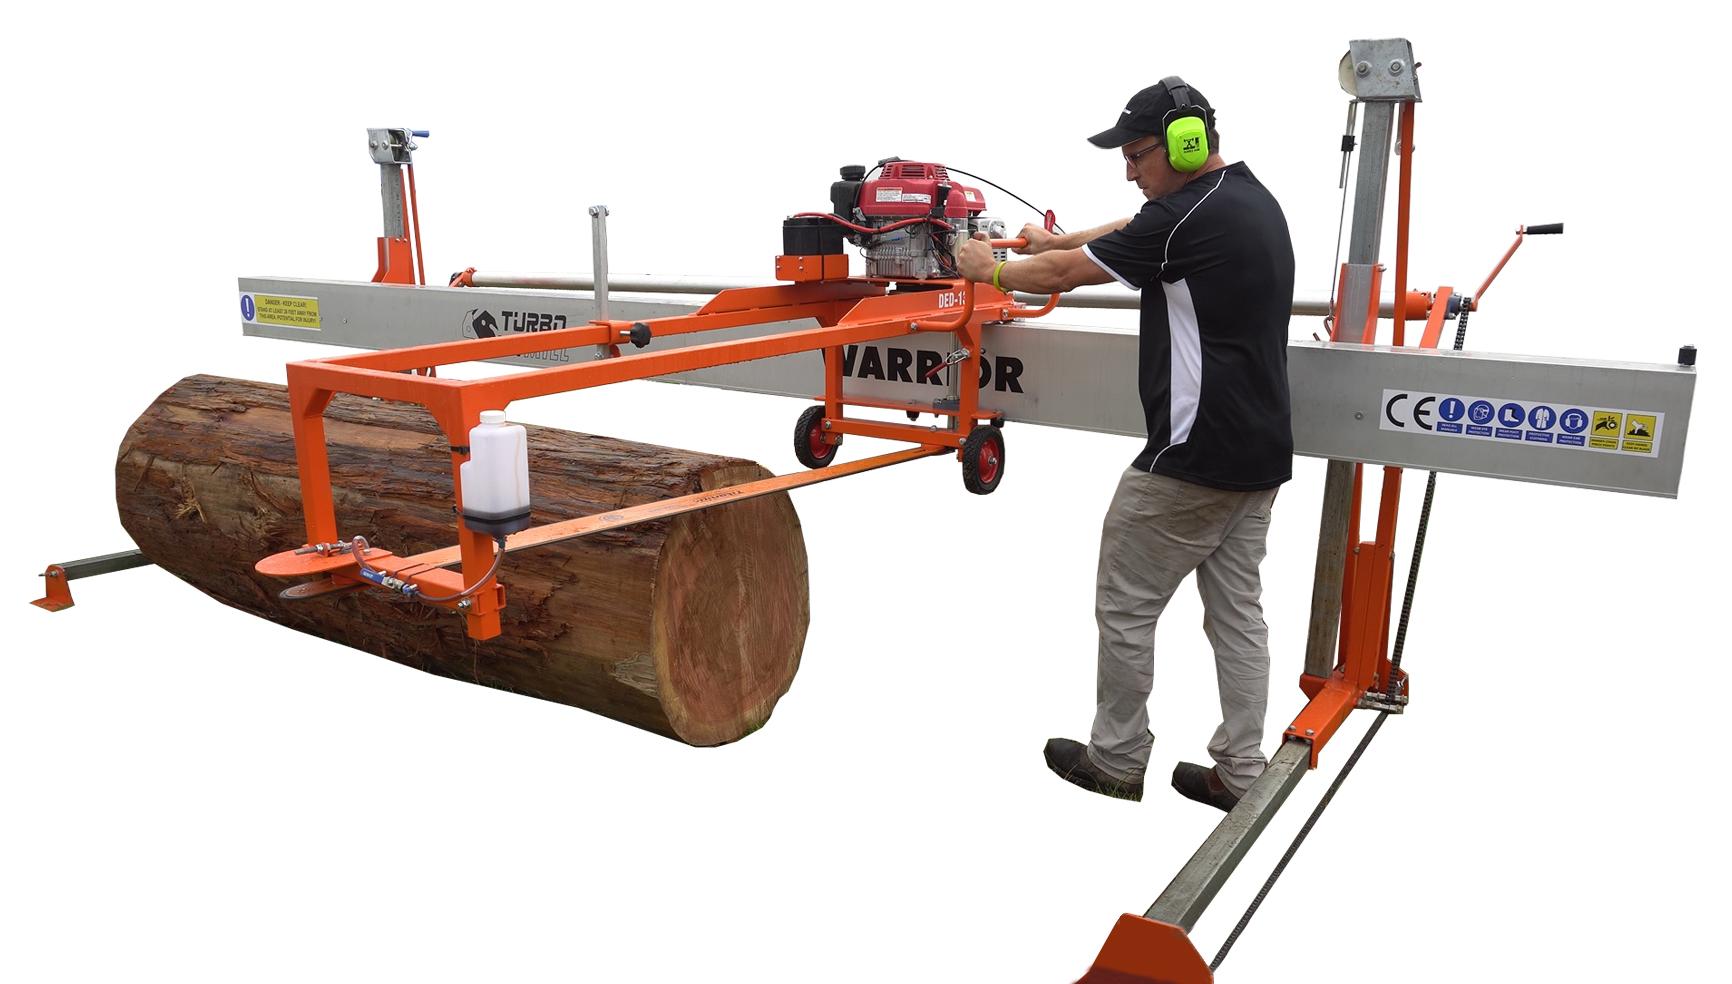 Slabber. - Fast cutting, wide slabs.